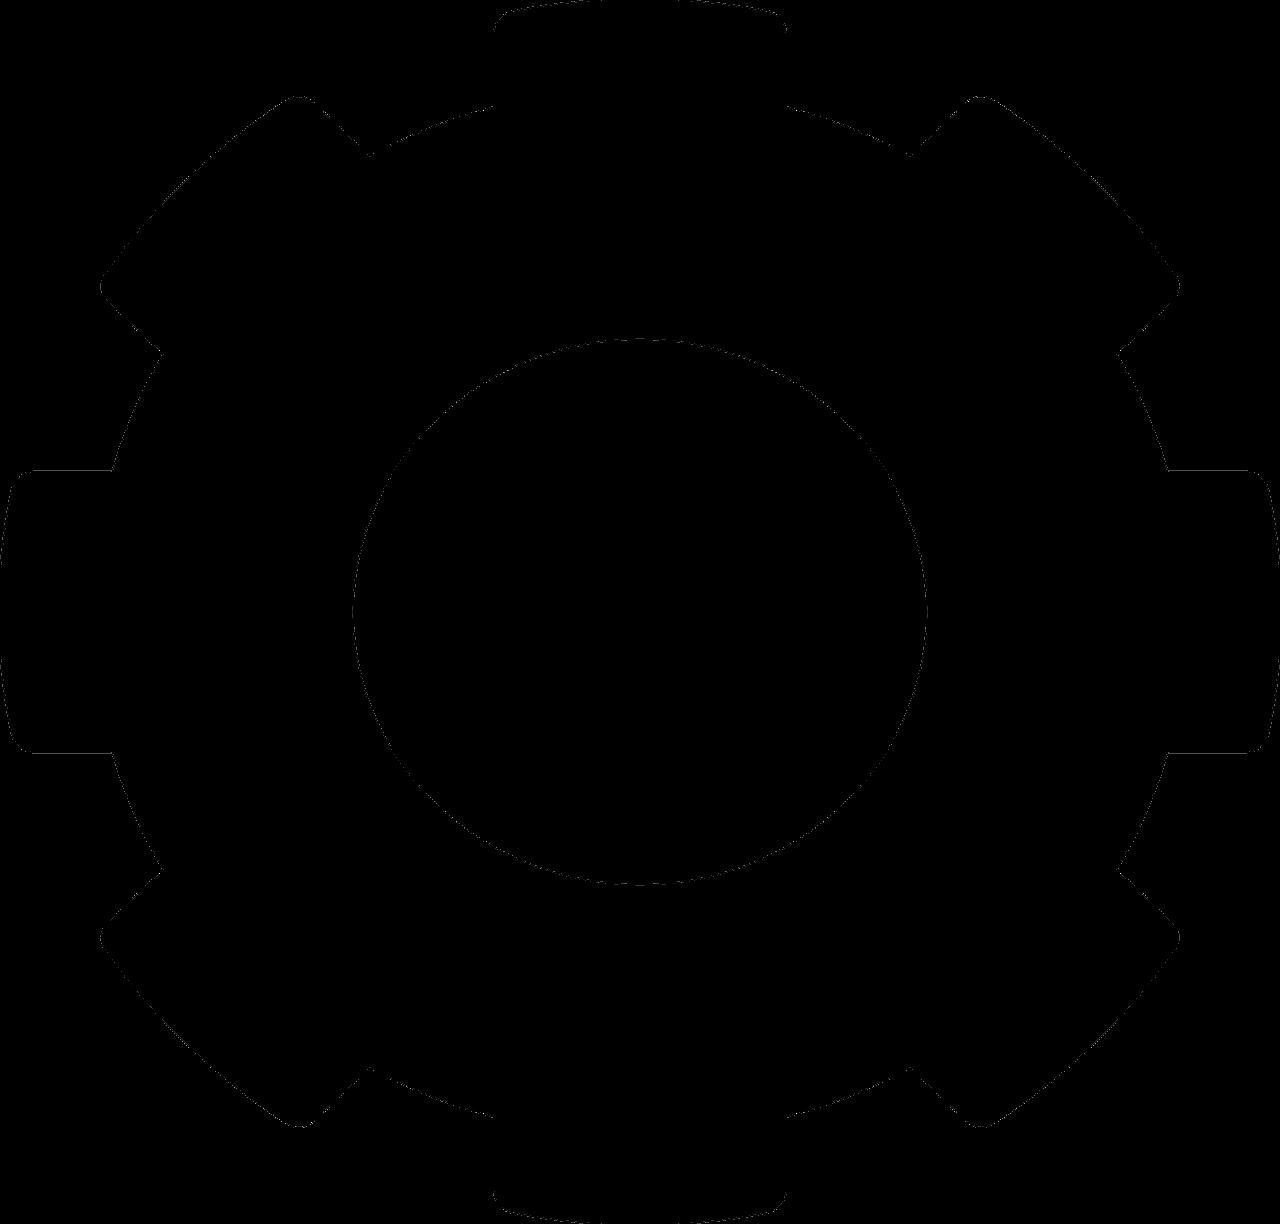 Gear clipart cogwheel. File png wikimedia commons